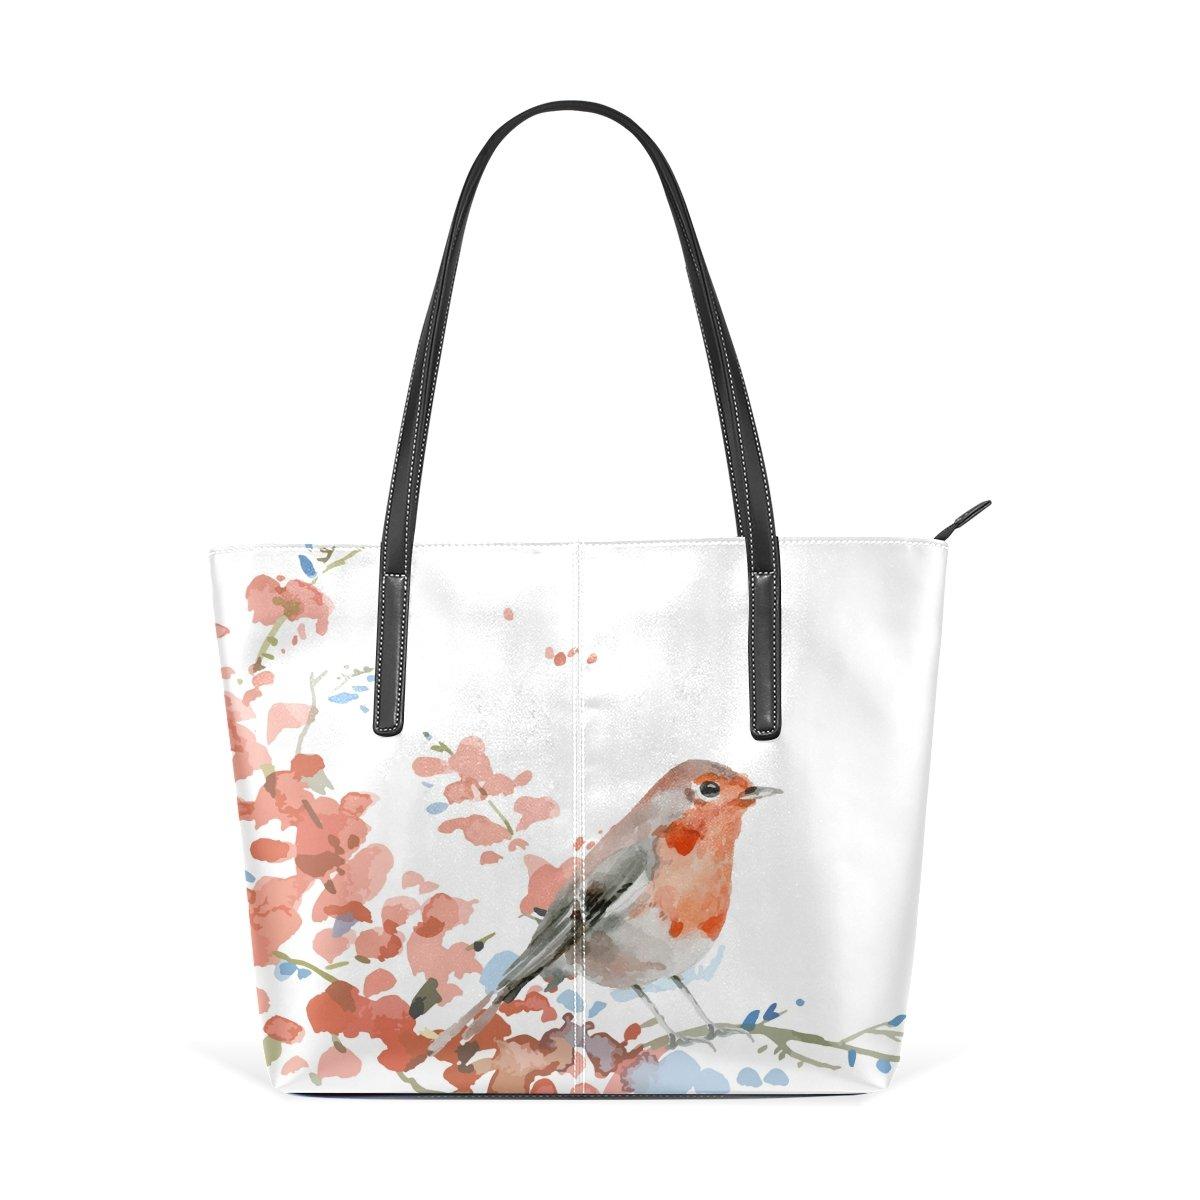 Womens Leather Top Handle Shoulder Handbag Ink Flower And Bird Large Work Tote Bag